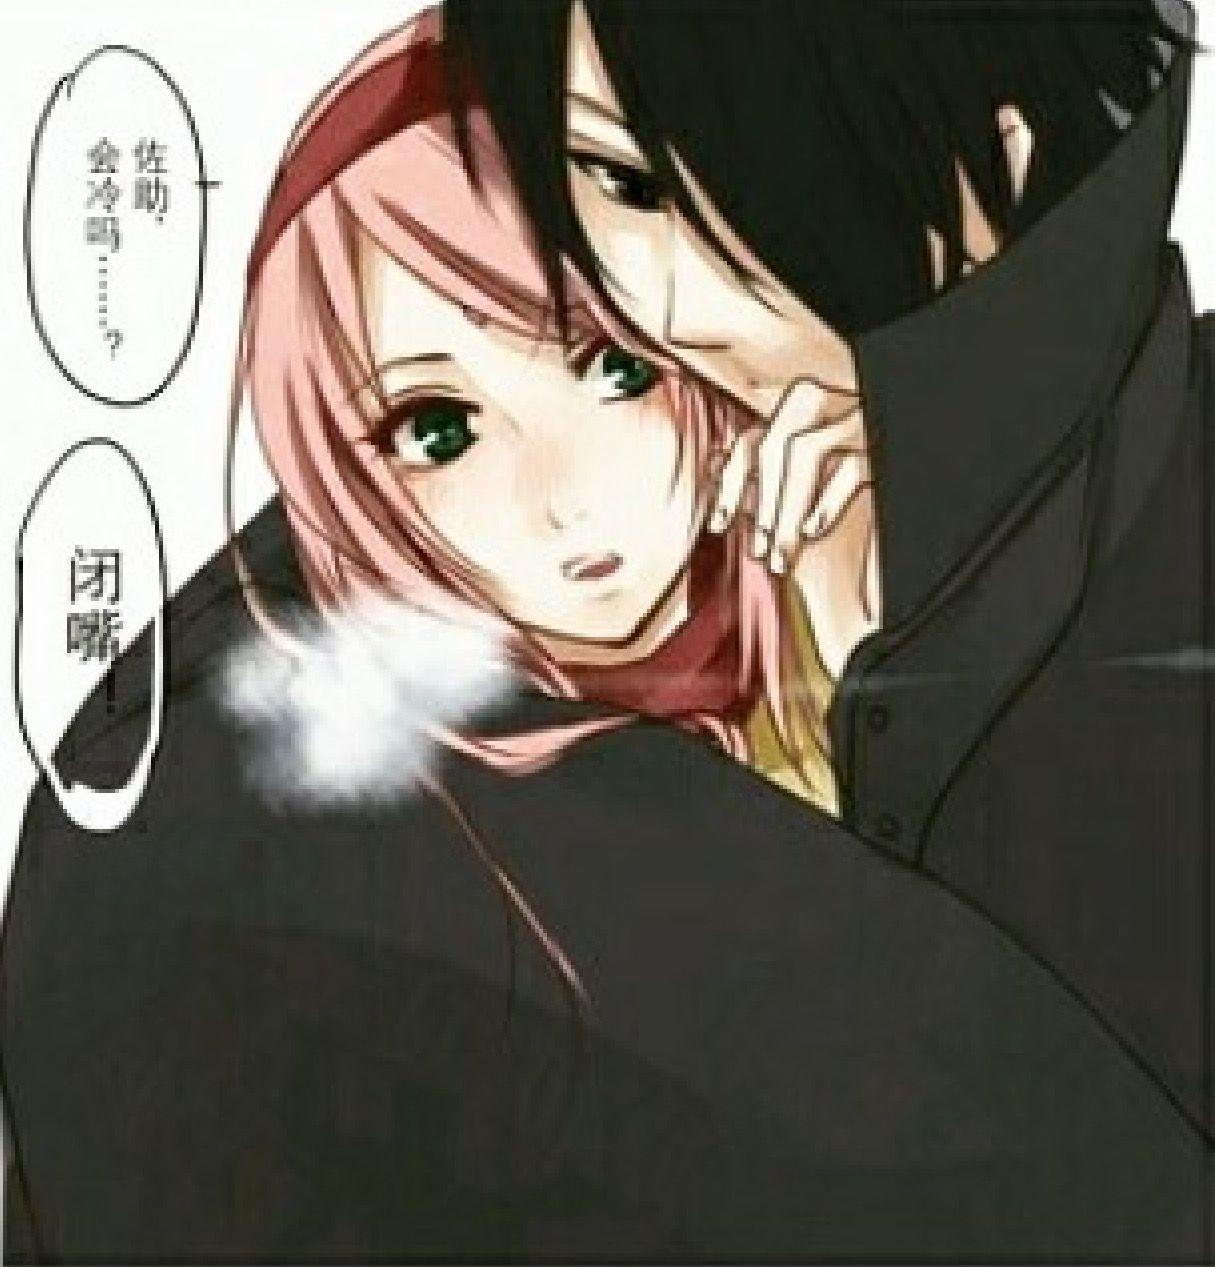 Sasusaku! I love it so much when he hug her and warm her up like that kyaaa!